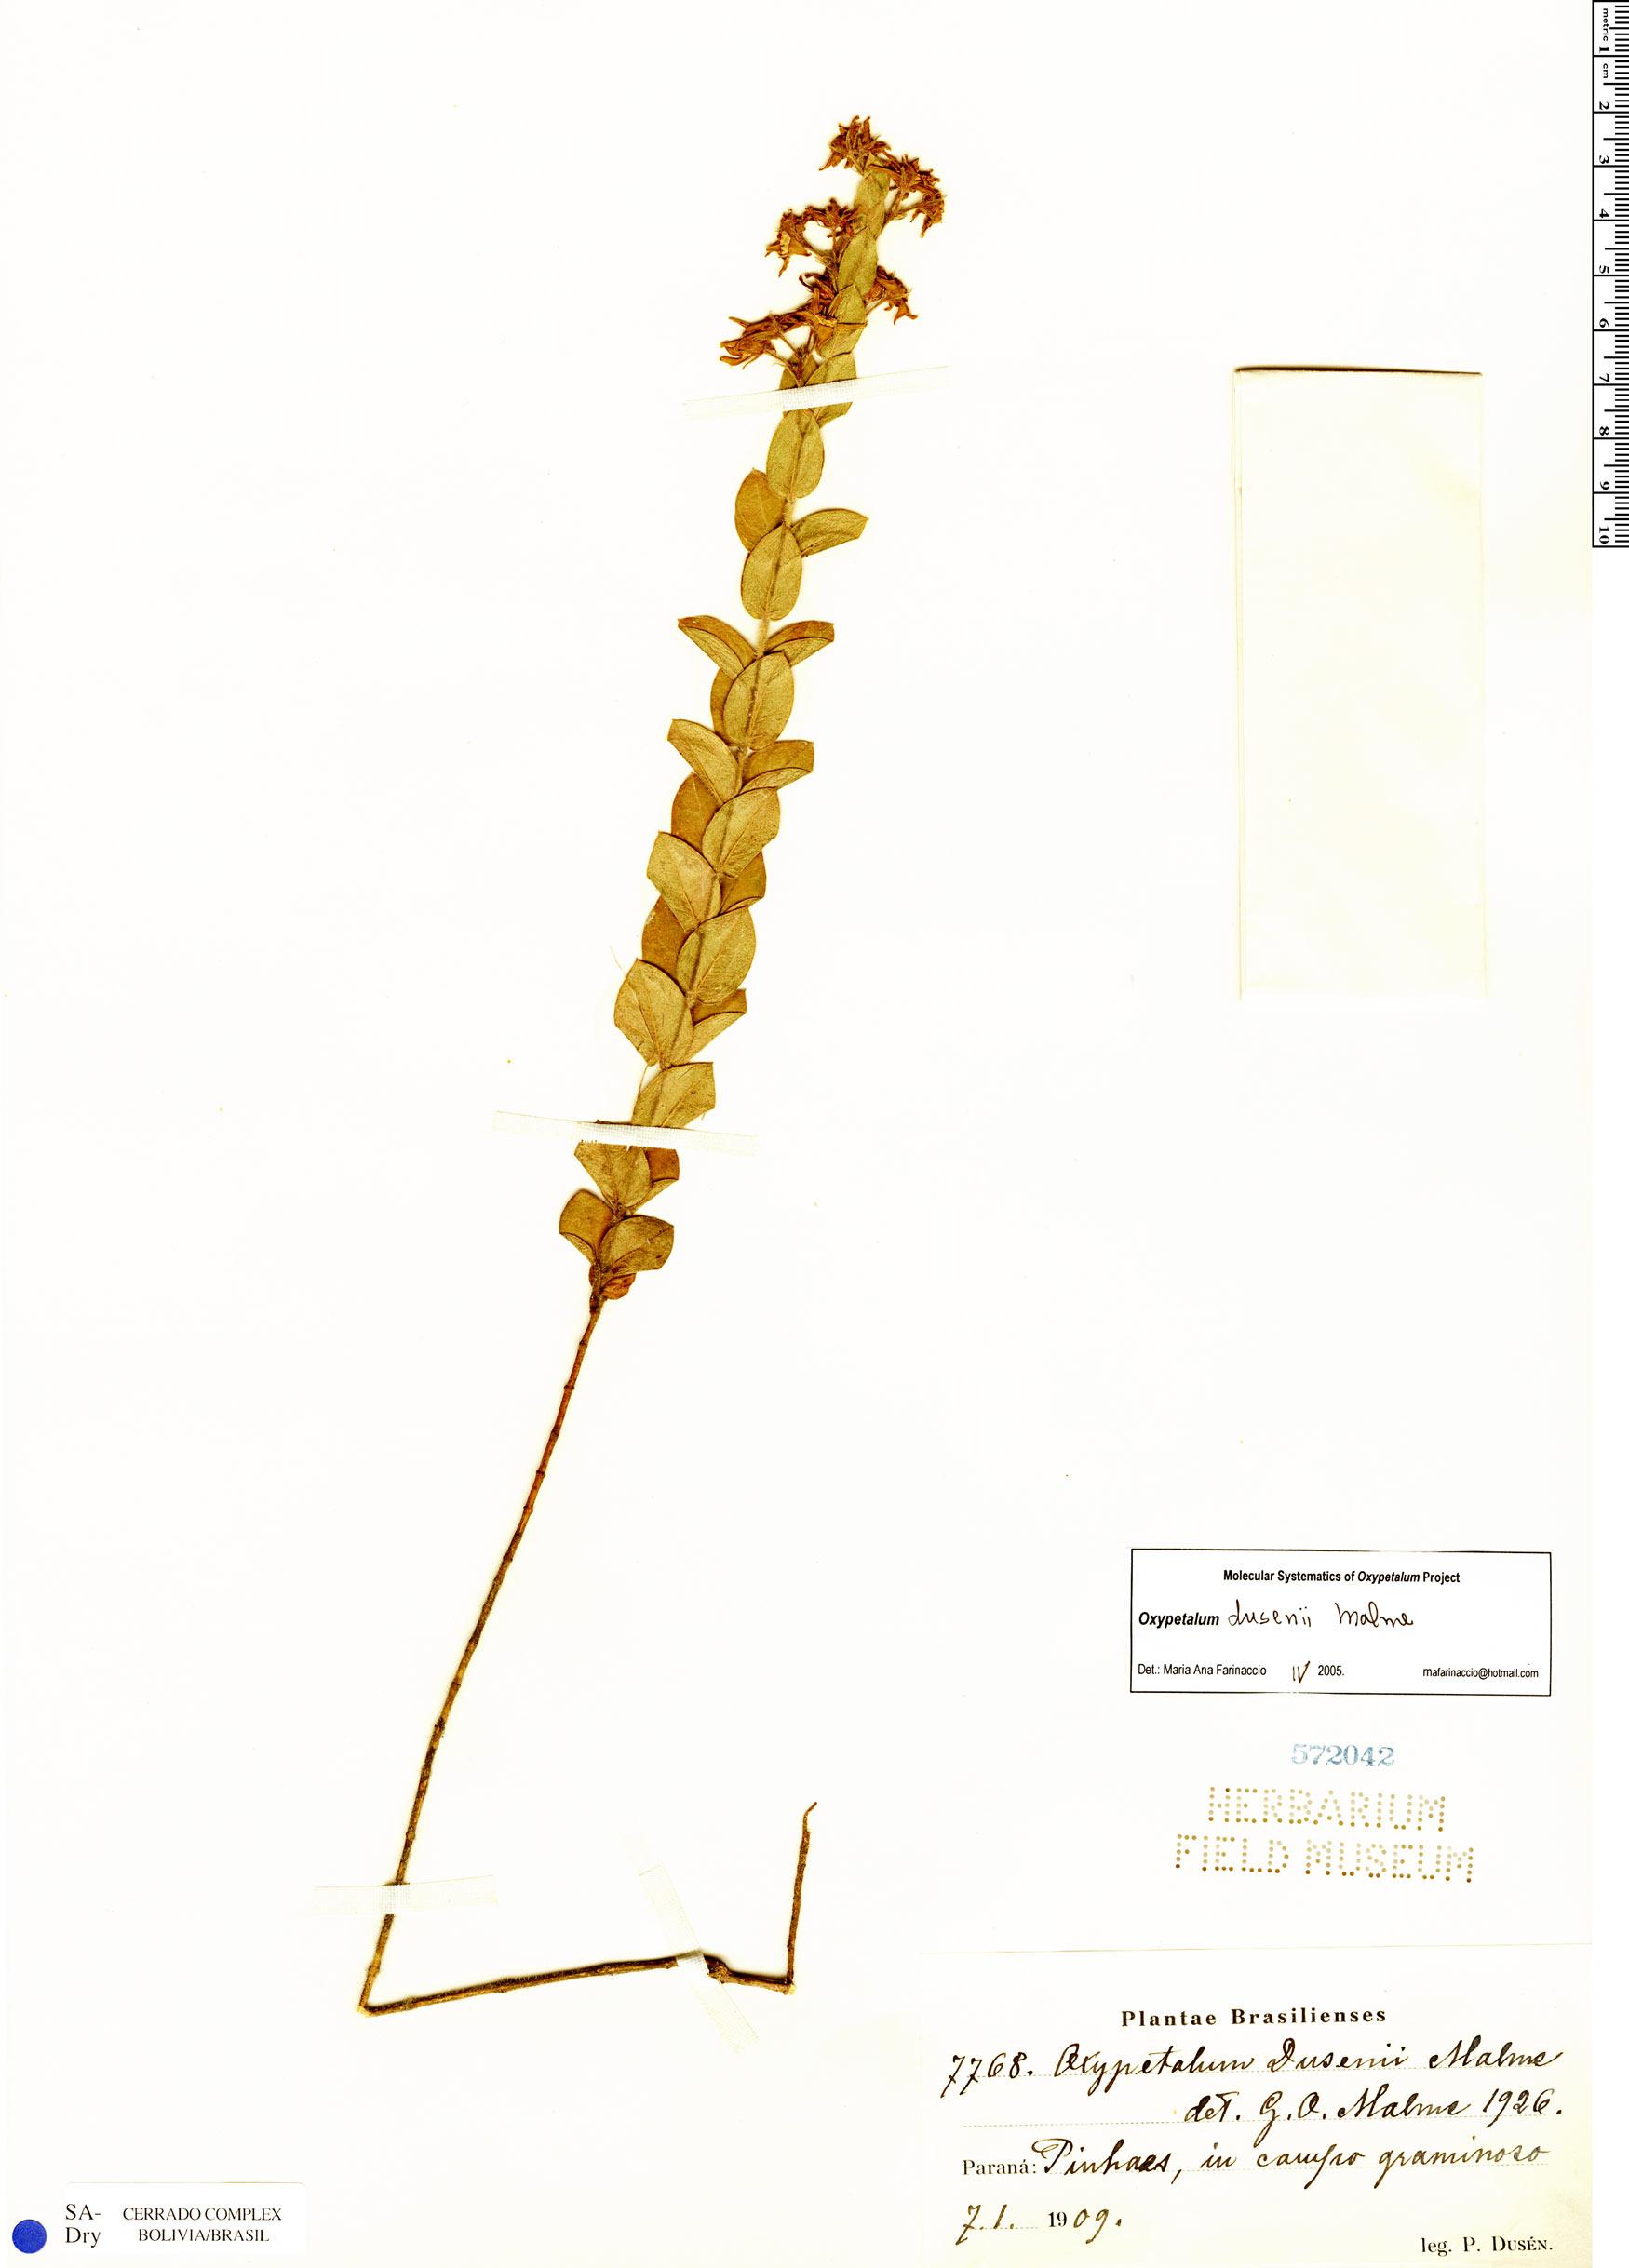 Specimen: Oxypetalum dusenii